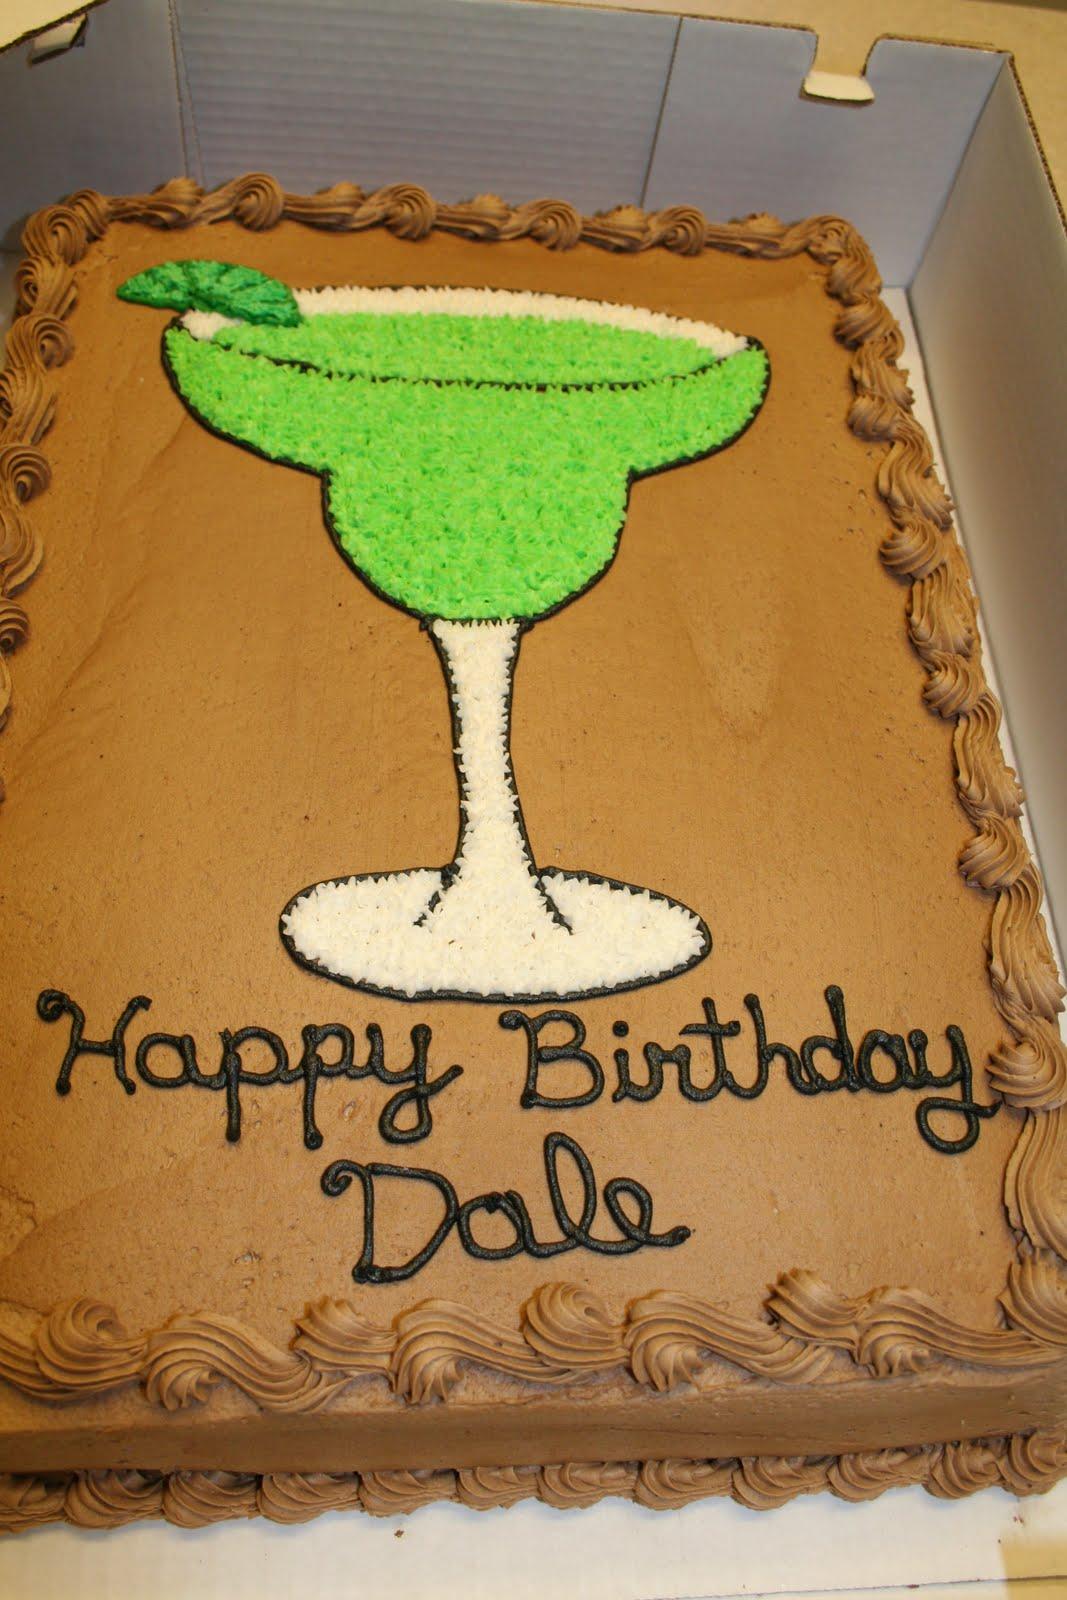 Rachels Creative Cakes Margarita Glass Creation